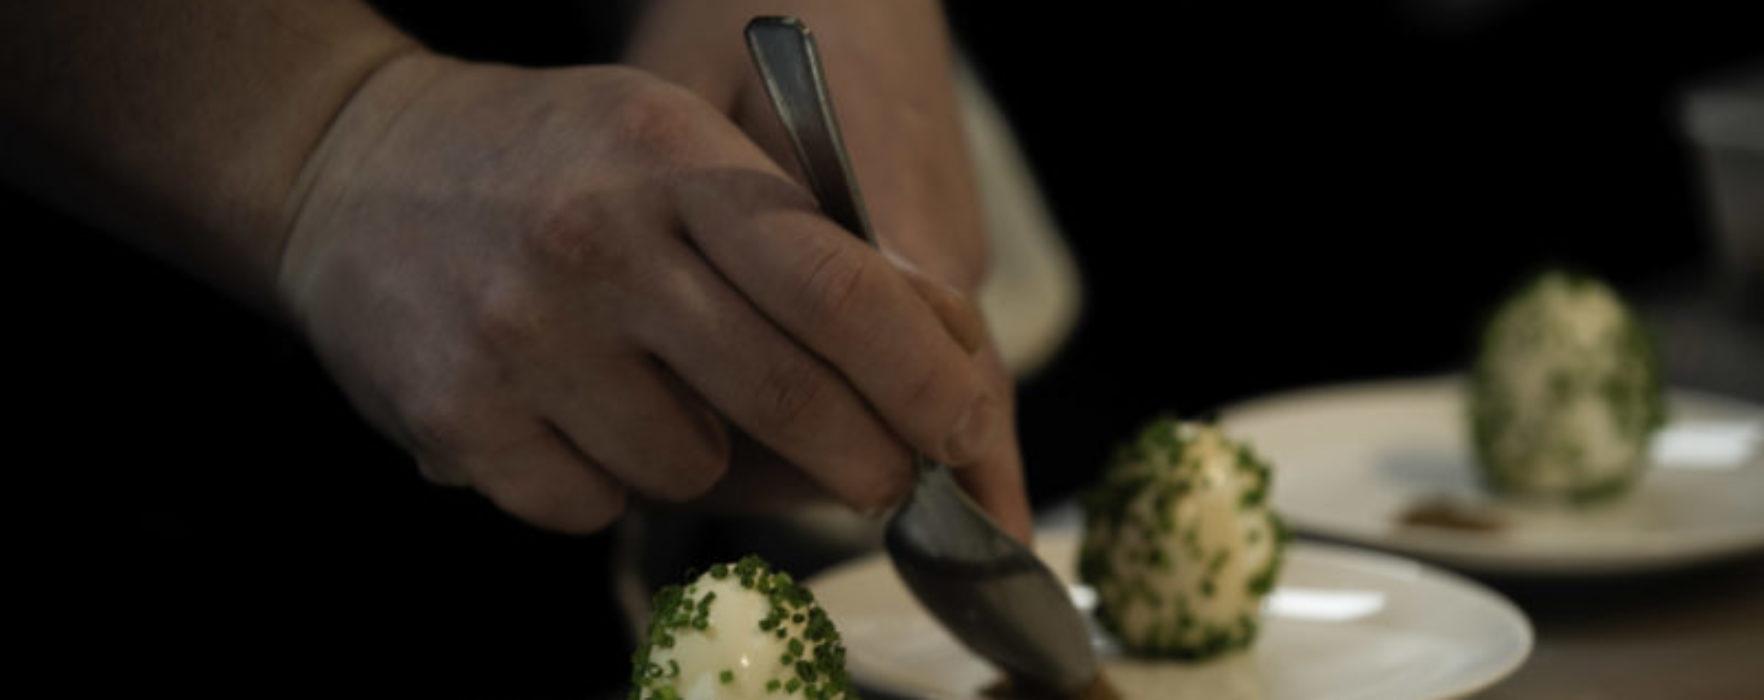 KALA'S recipe for success as VIVA checks out Gary Usher's first city centre eatery